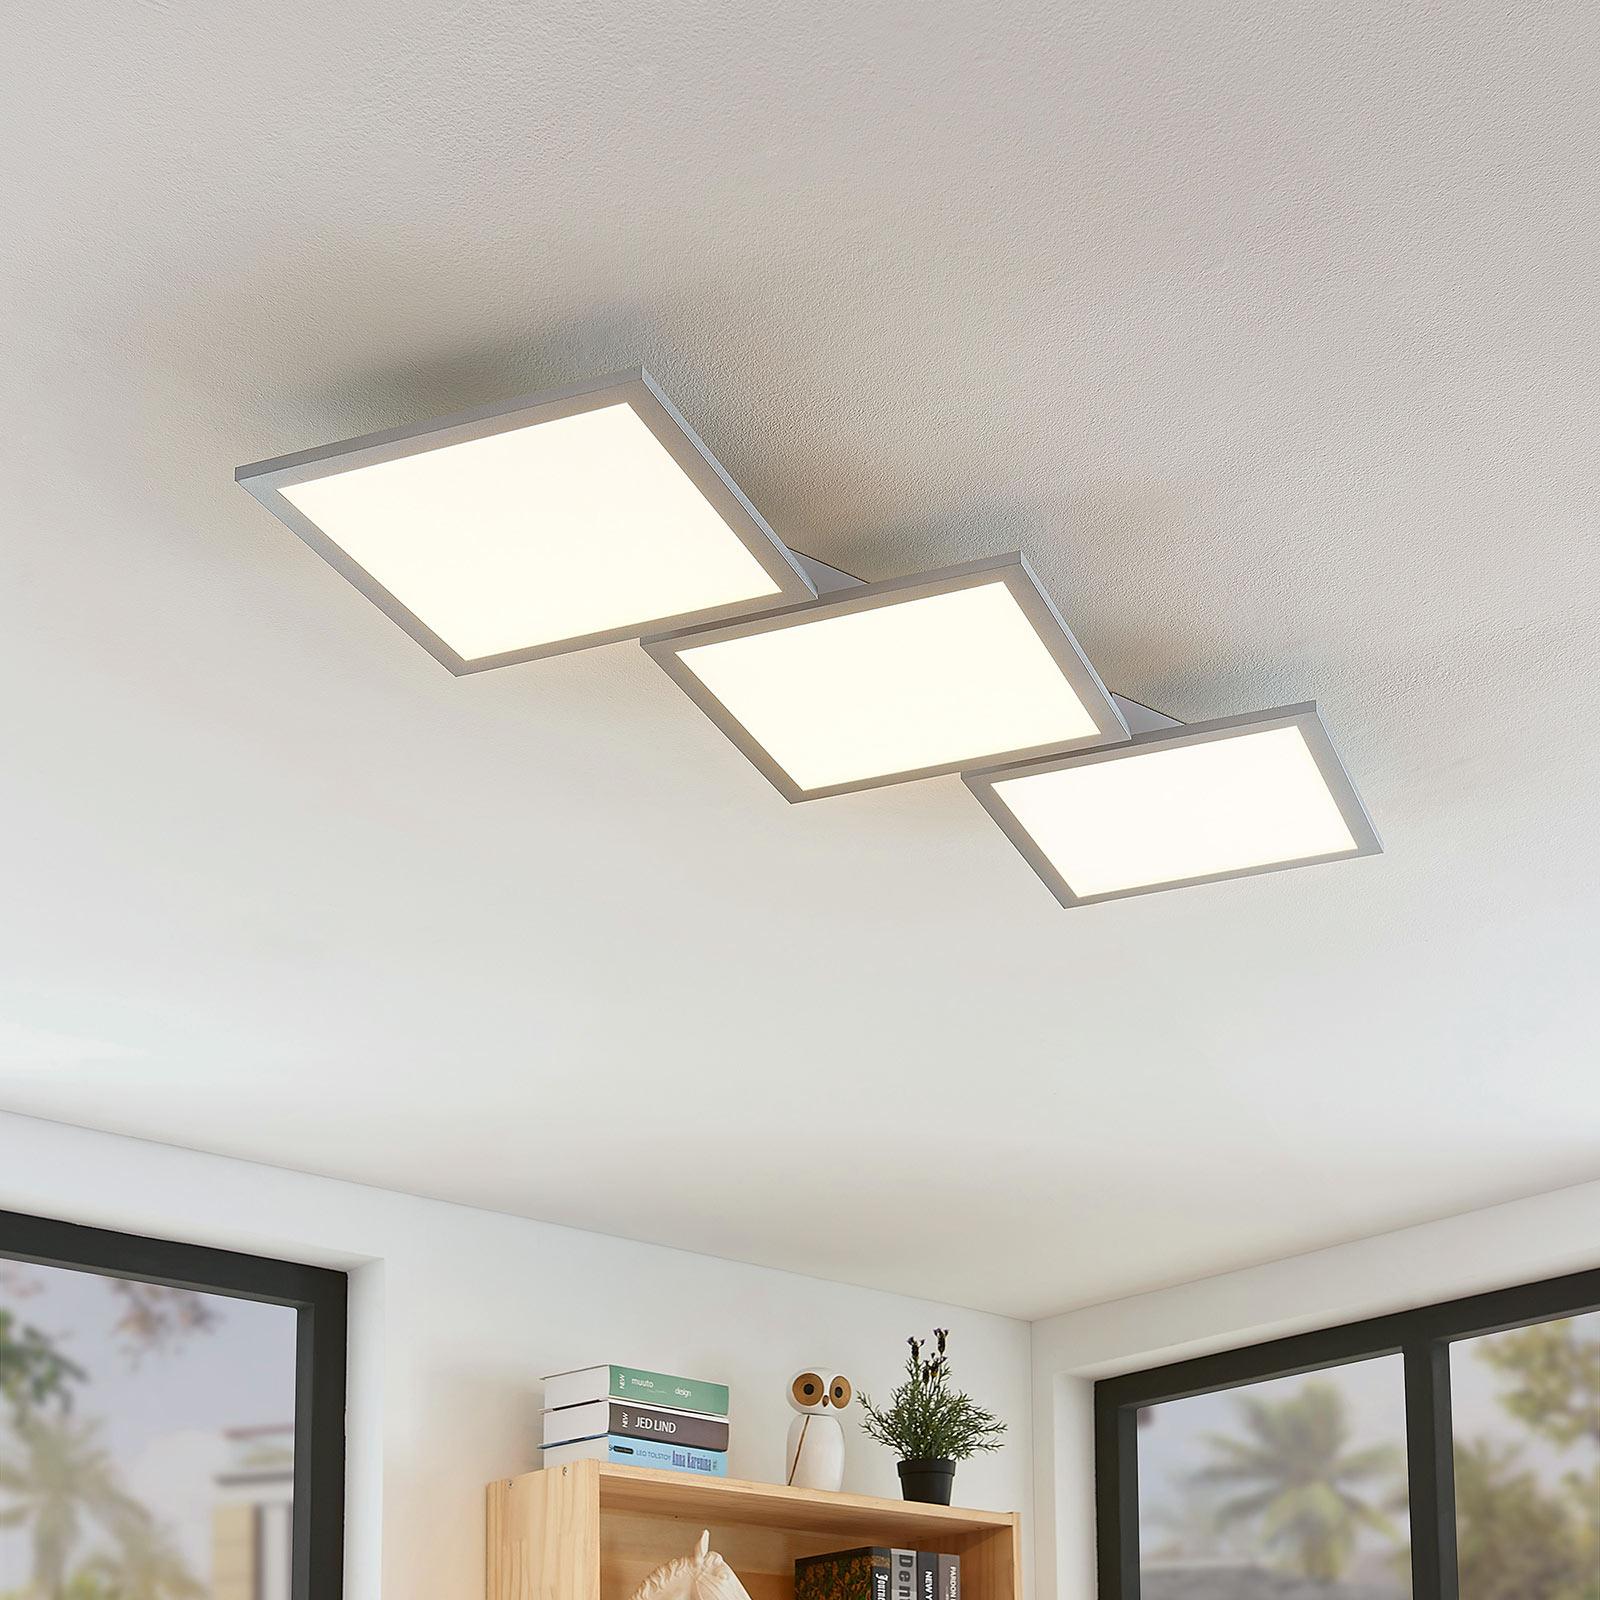 LED plafondlamp Ilira, dimbaar, 3 lampjes